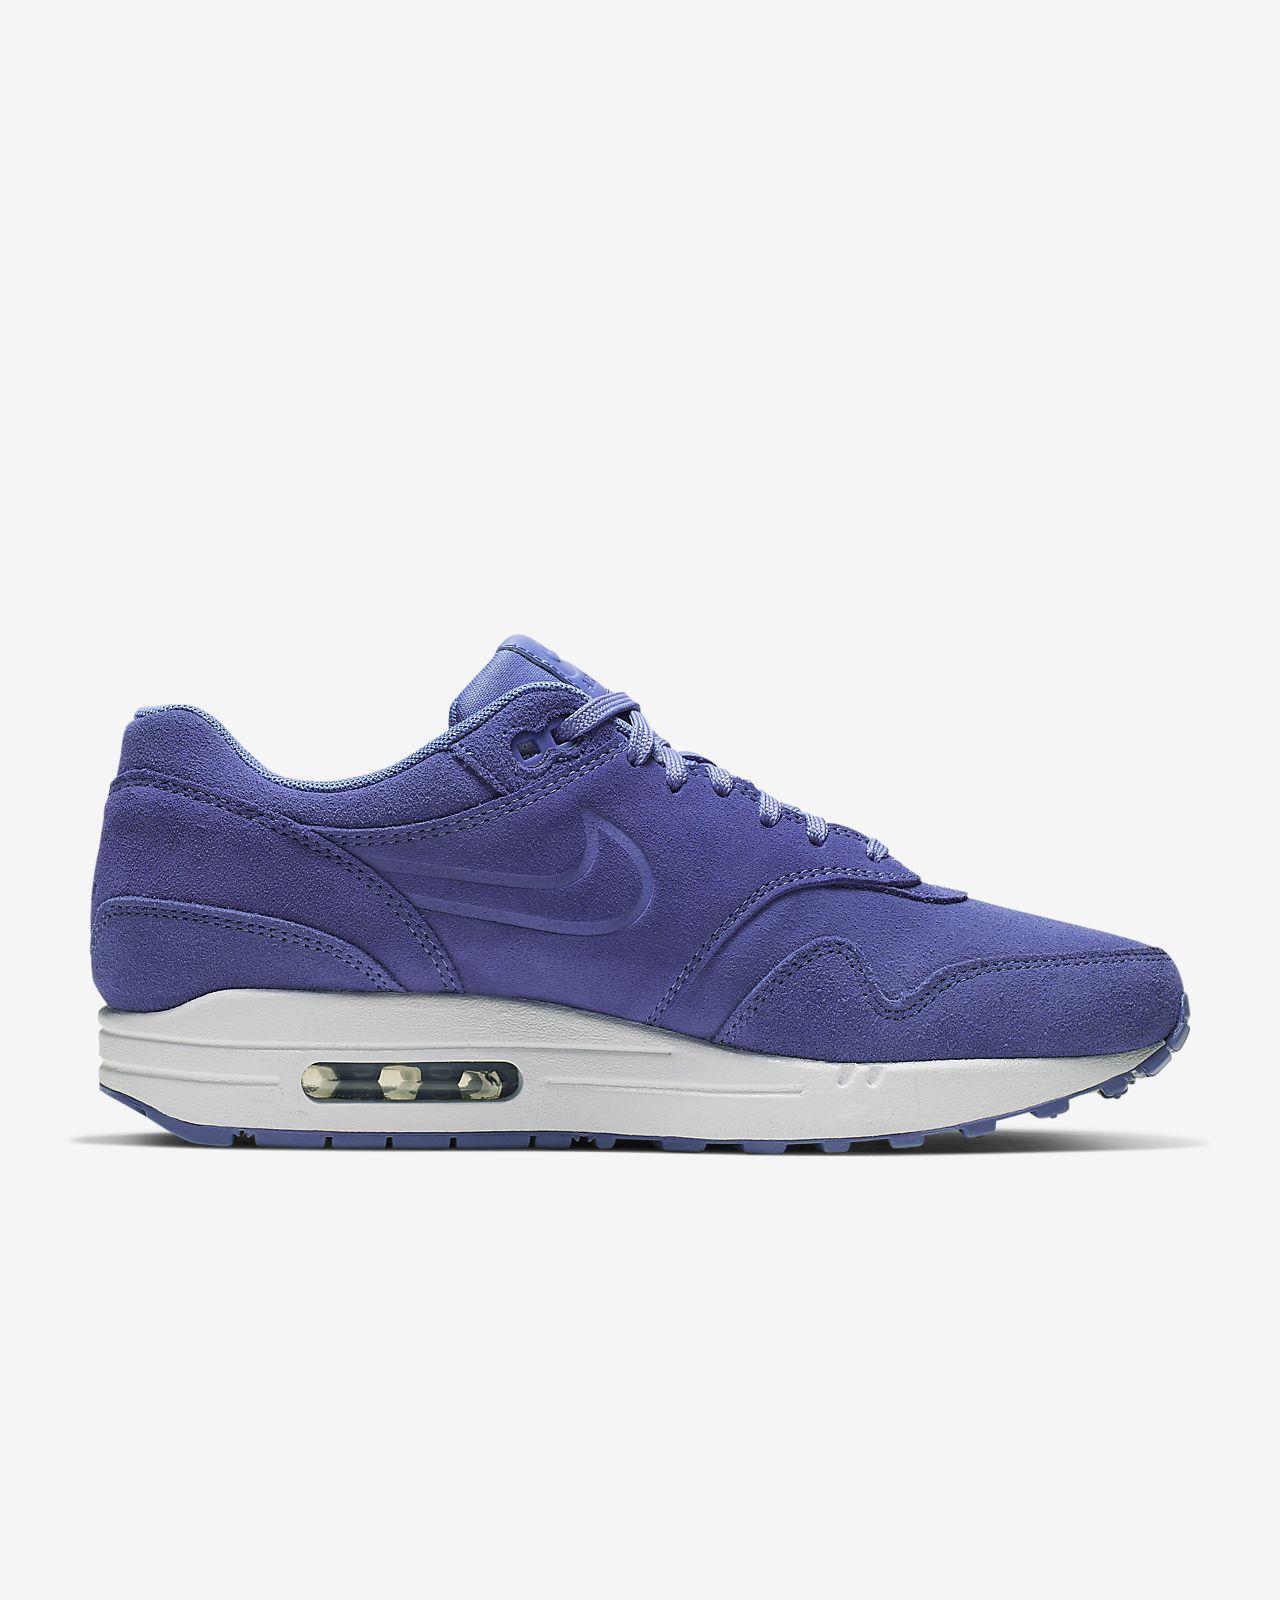 half off 3aa4a bfe53 ... Nike Air Max 1 Premium Women s Shoe